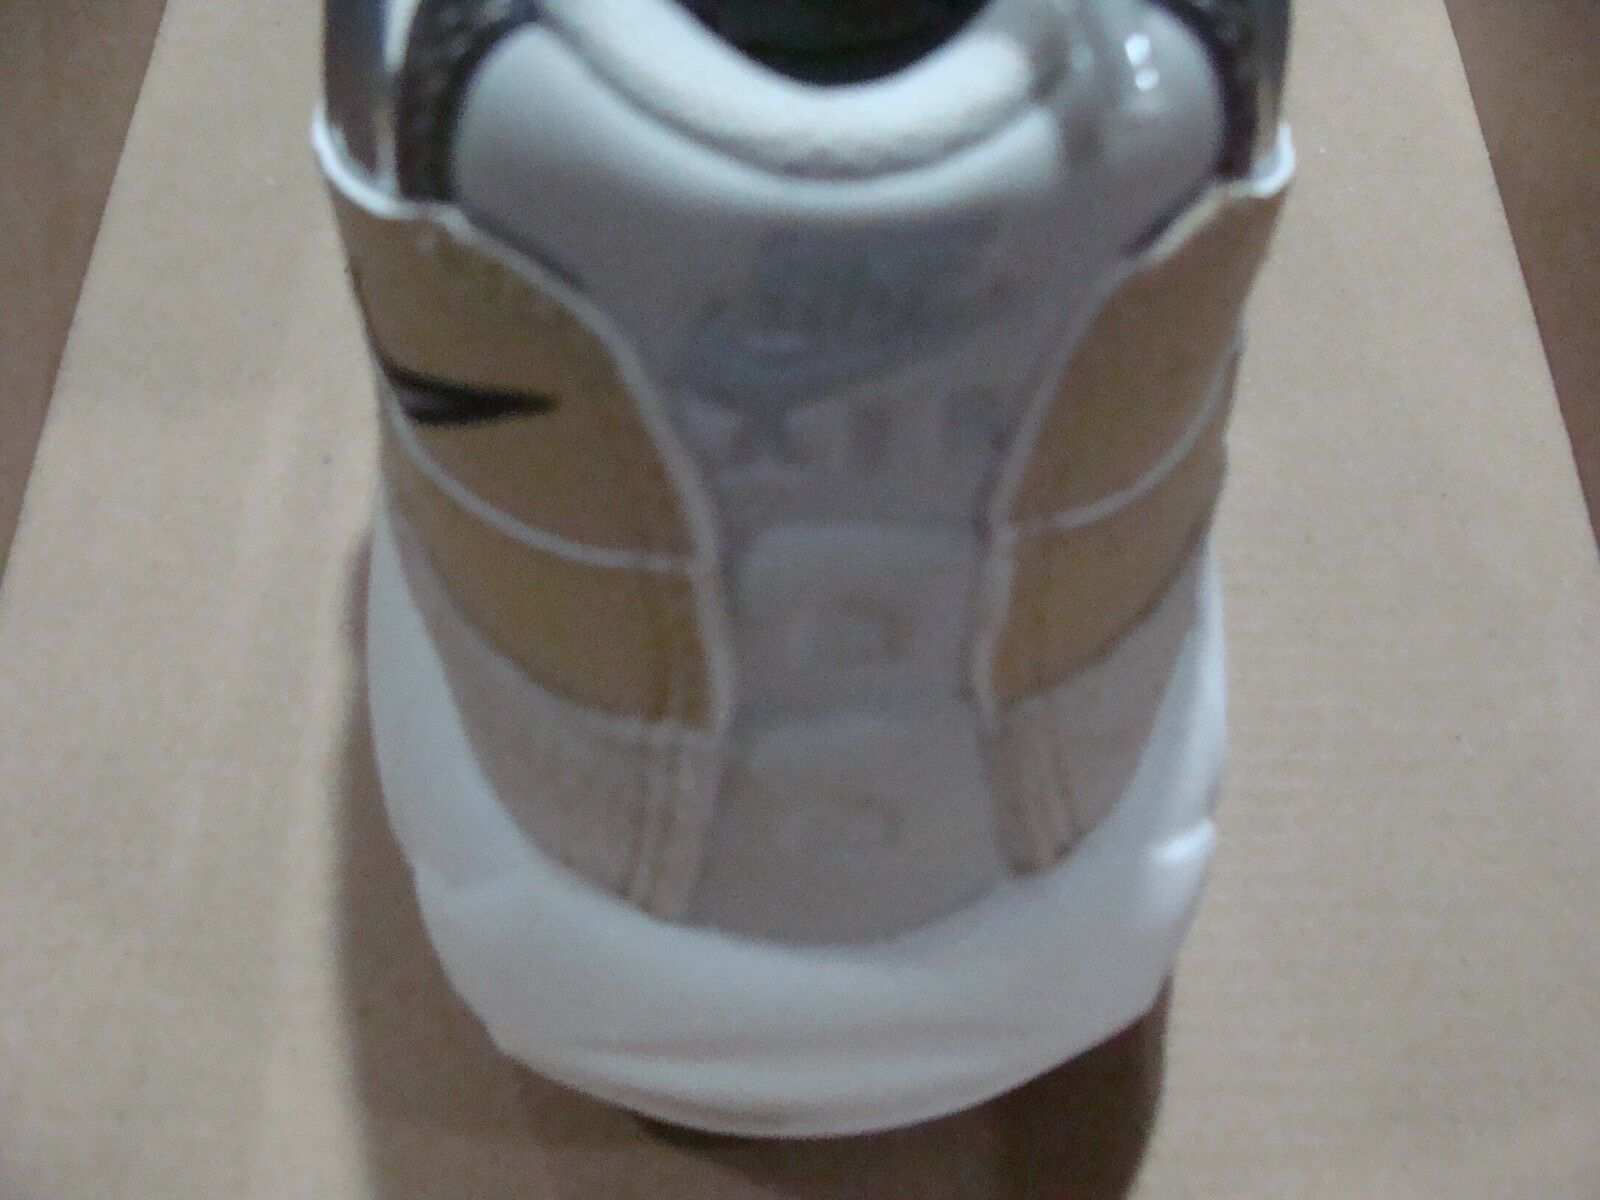 WMNS NIKE AIR MAX 95 Light Bone Bone Bone Wolf Grey Mushroom 307960 009 Size 8, 8.5 d931f0